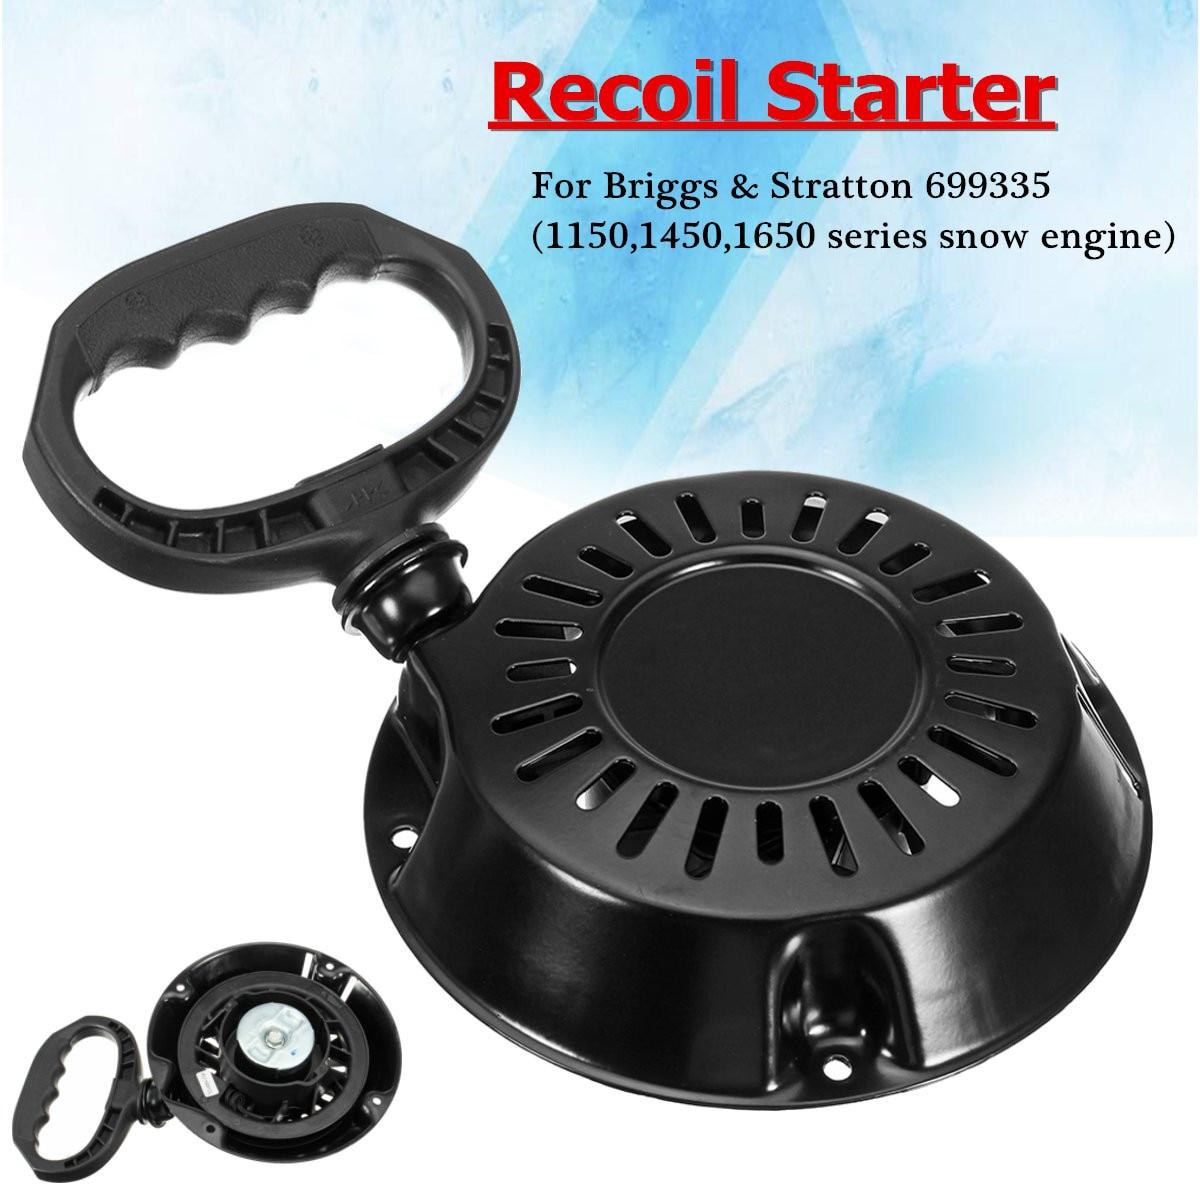 Recoil Starter For Briggs /& Stratton 1150 1450 1650 Snow Series Motor 699335